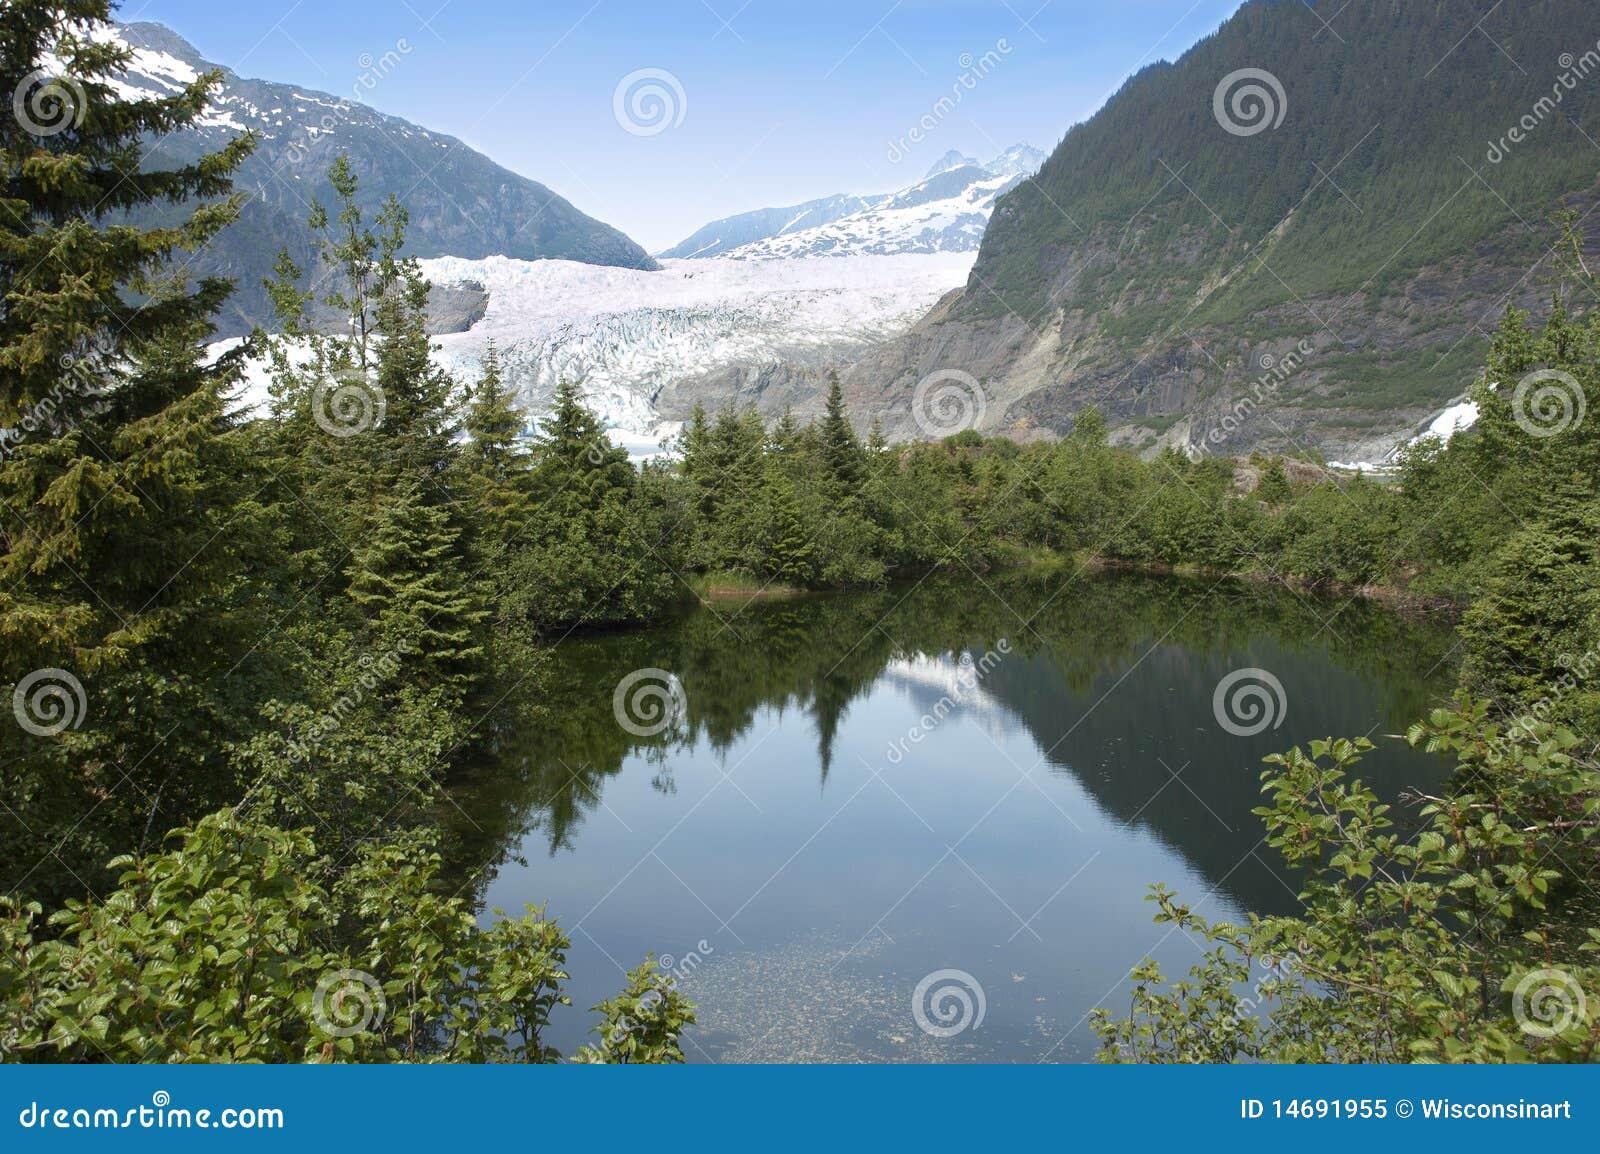 Mendenhall Glacier and Lake Near Juneau Alaska